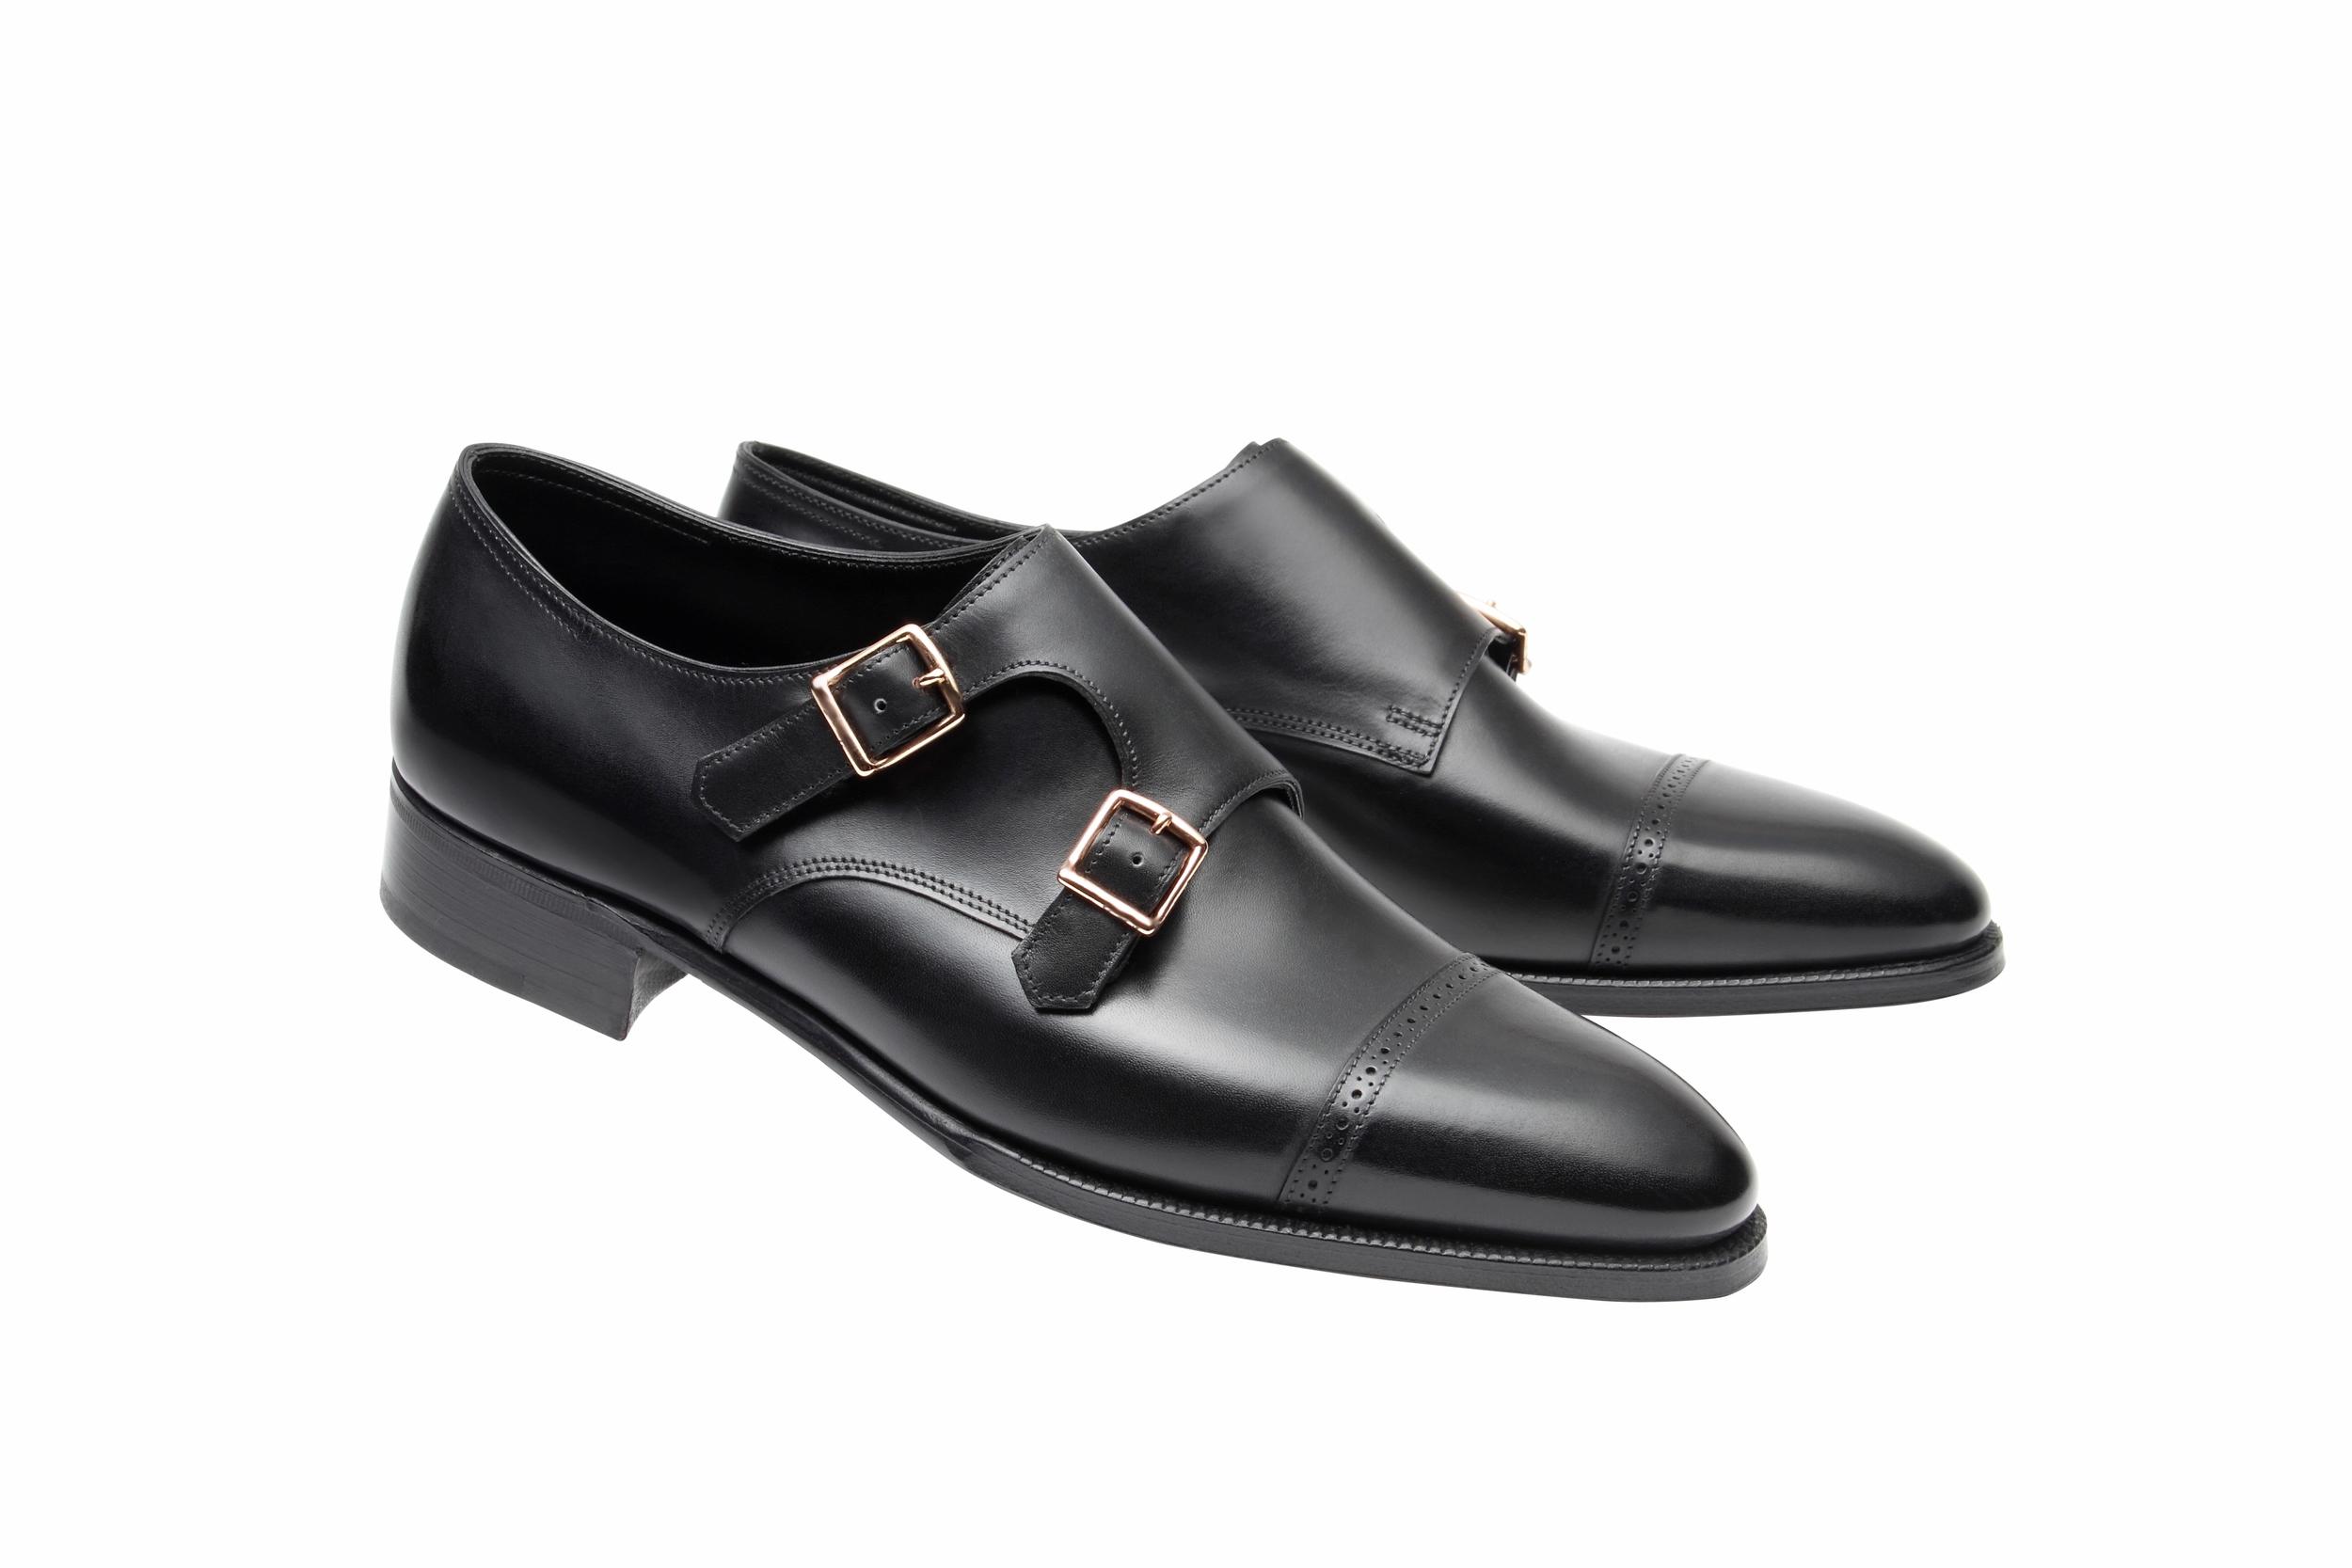 JL-Philip-II-Double-Buckle-Black Oxford Calf.jpg